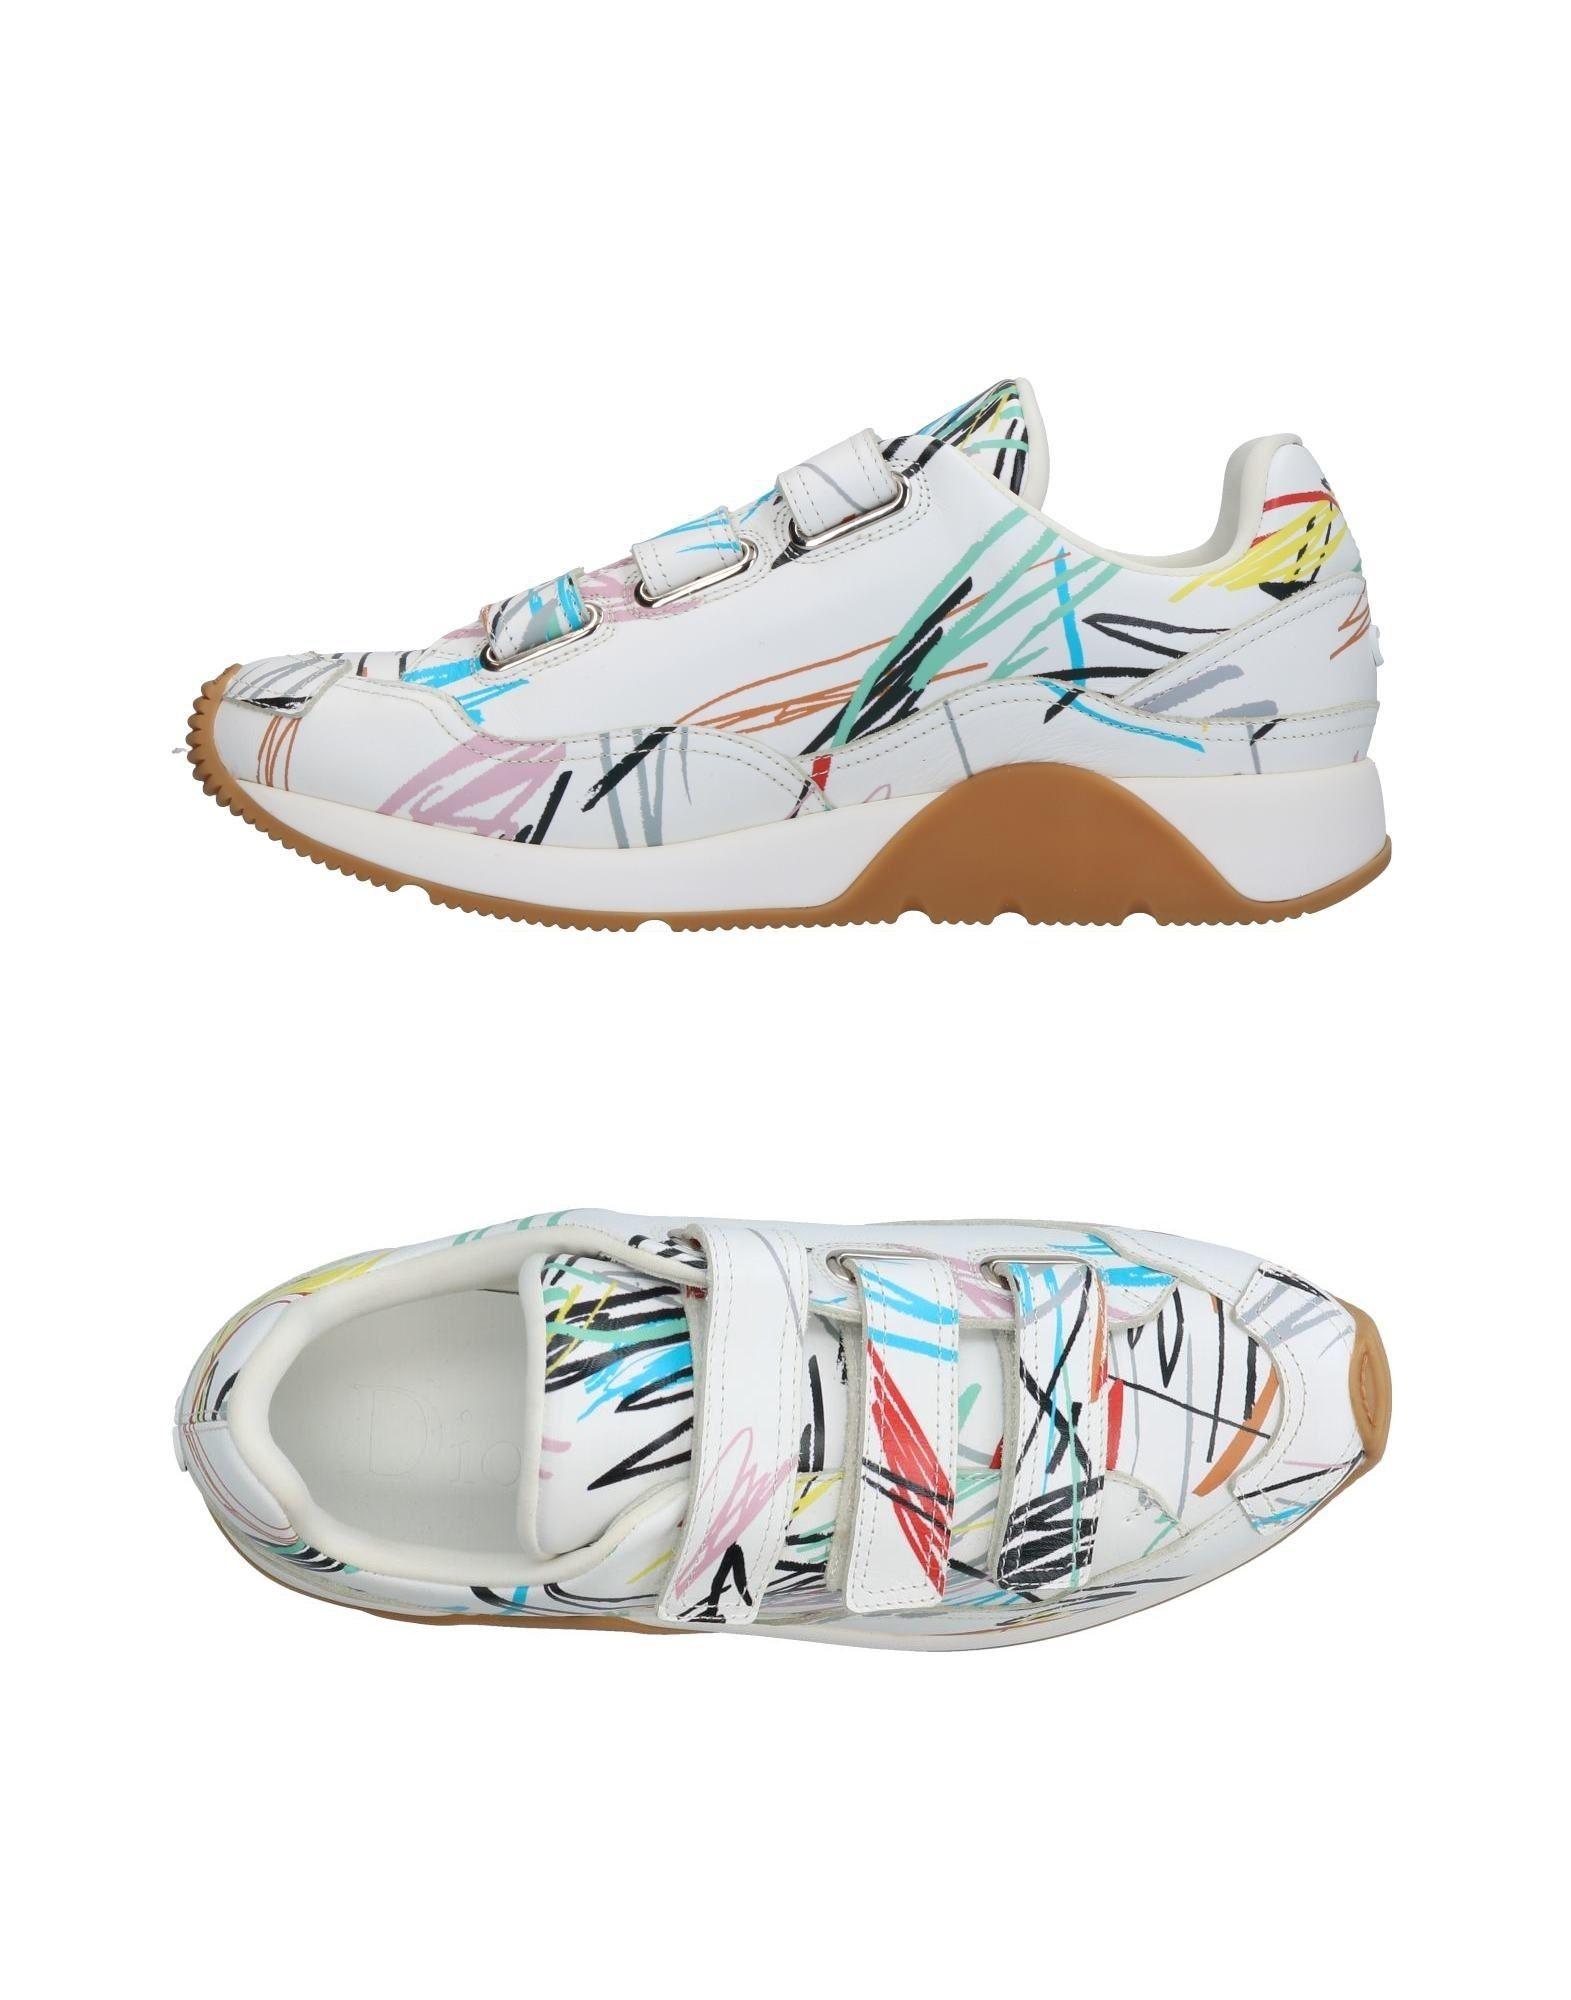 Sneakers Dior Homme Femme - Sneakers Dior Homme sur